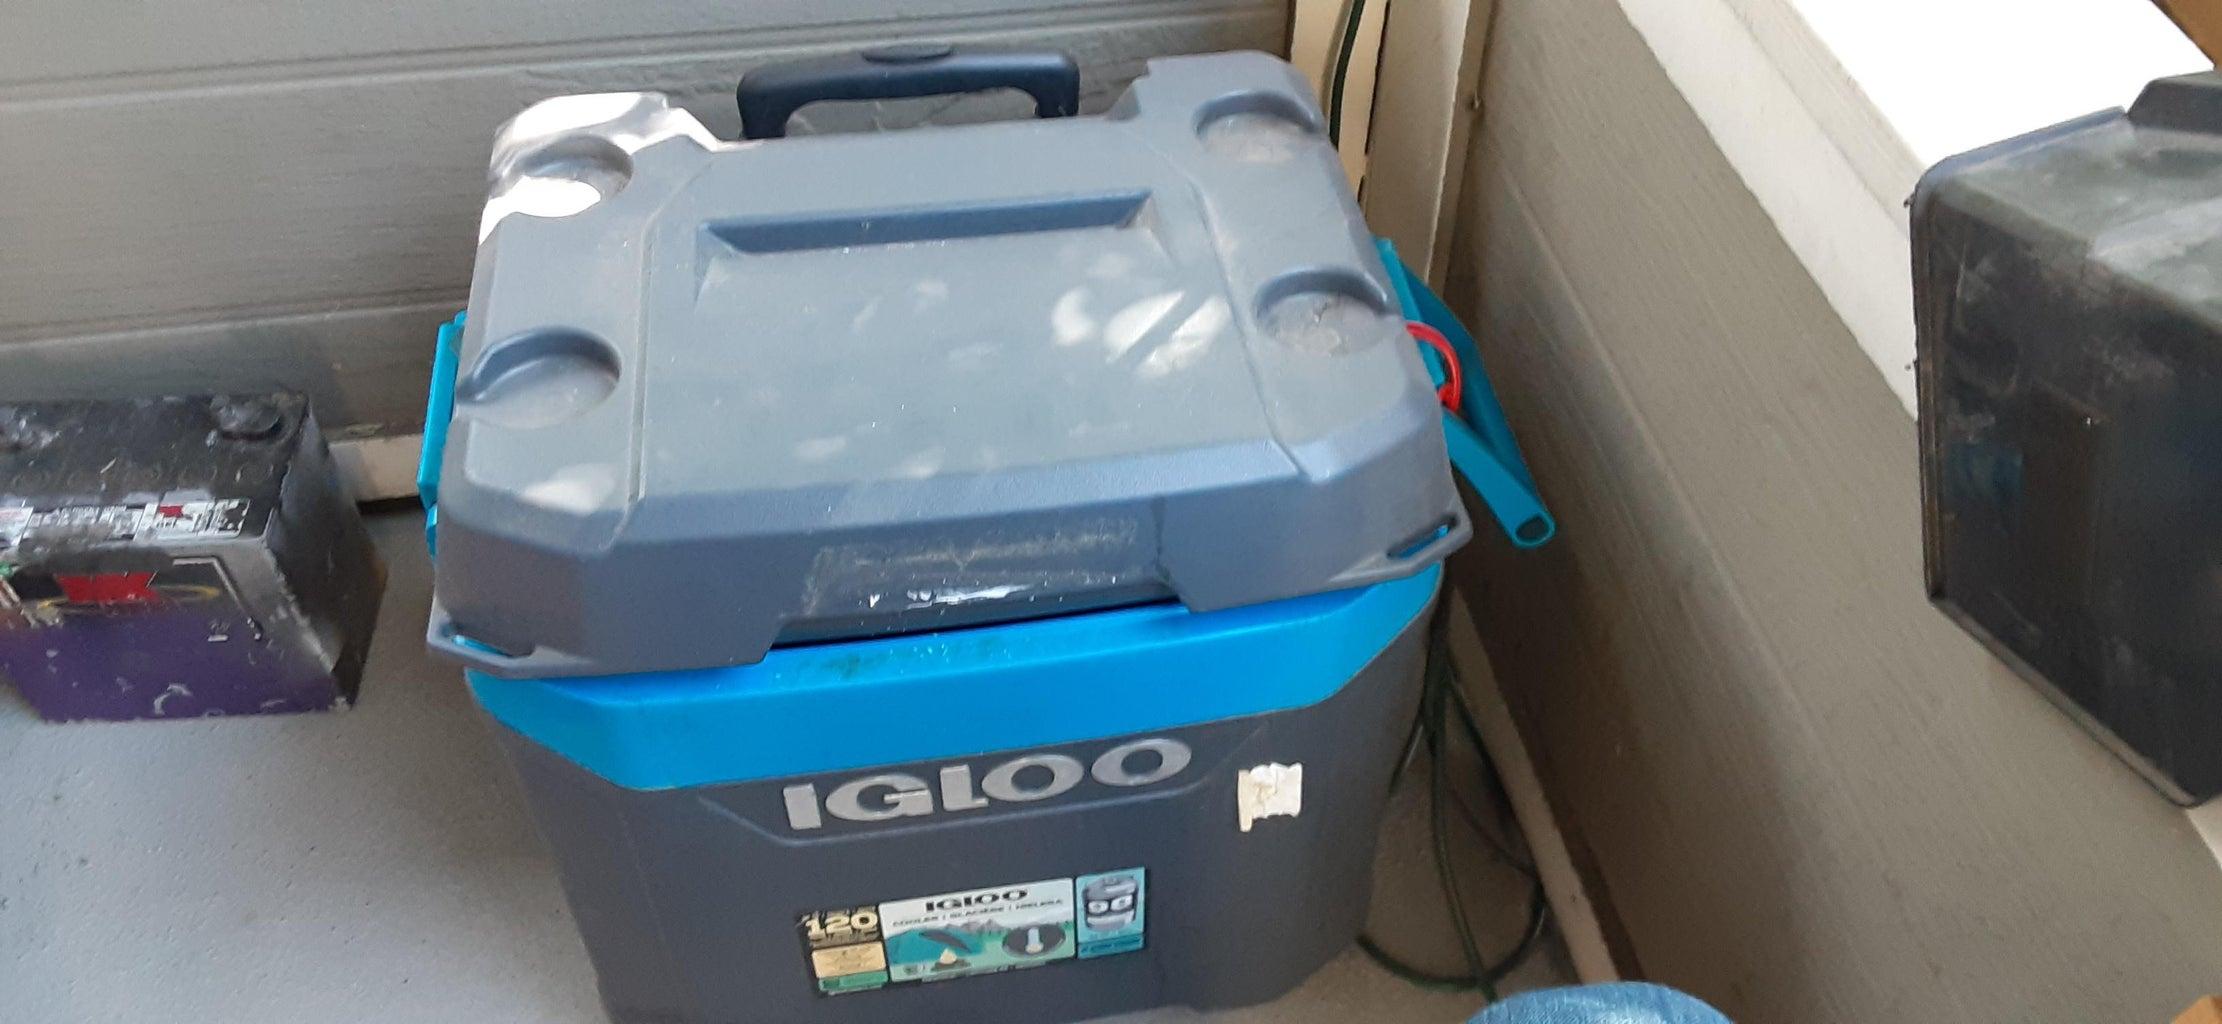 Weatherproofing, Freezeproofing, and Storage.